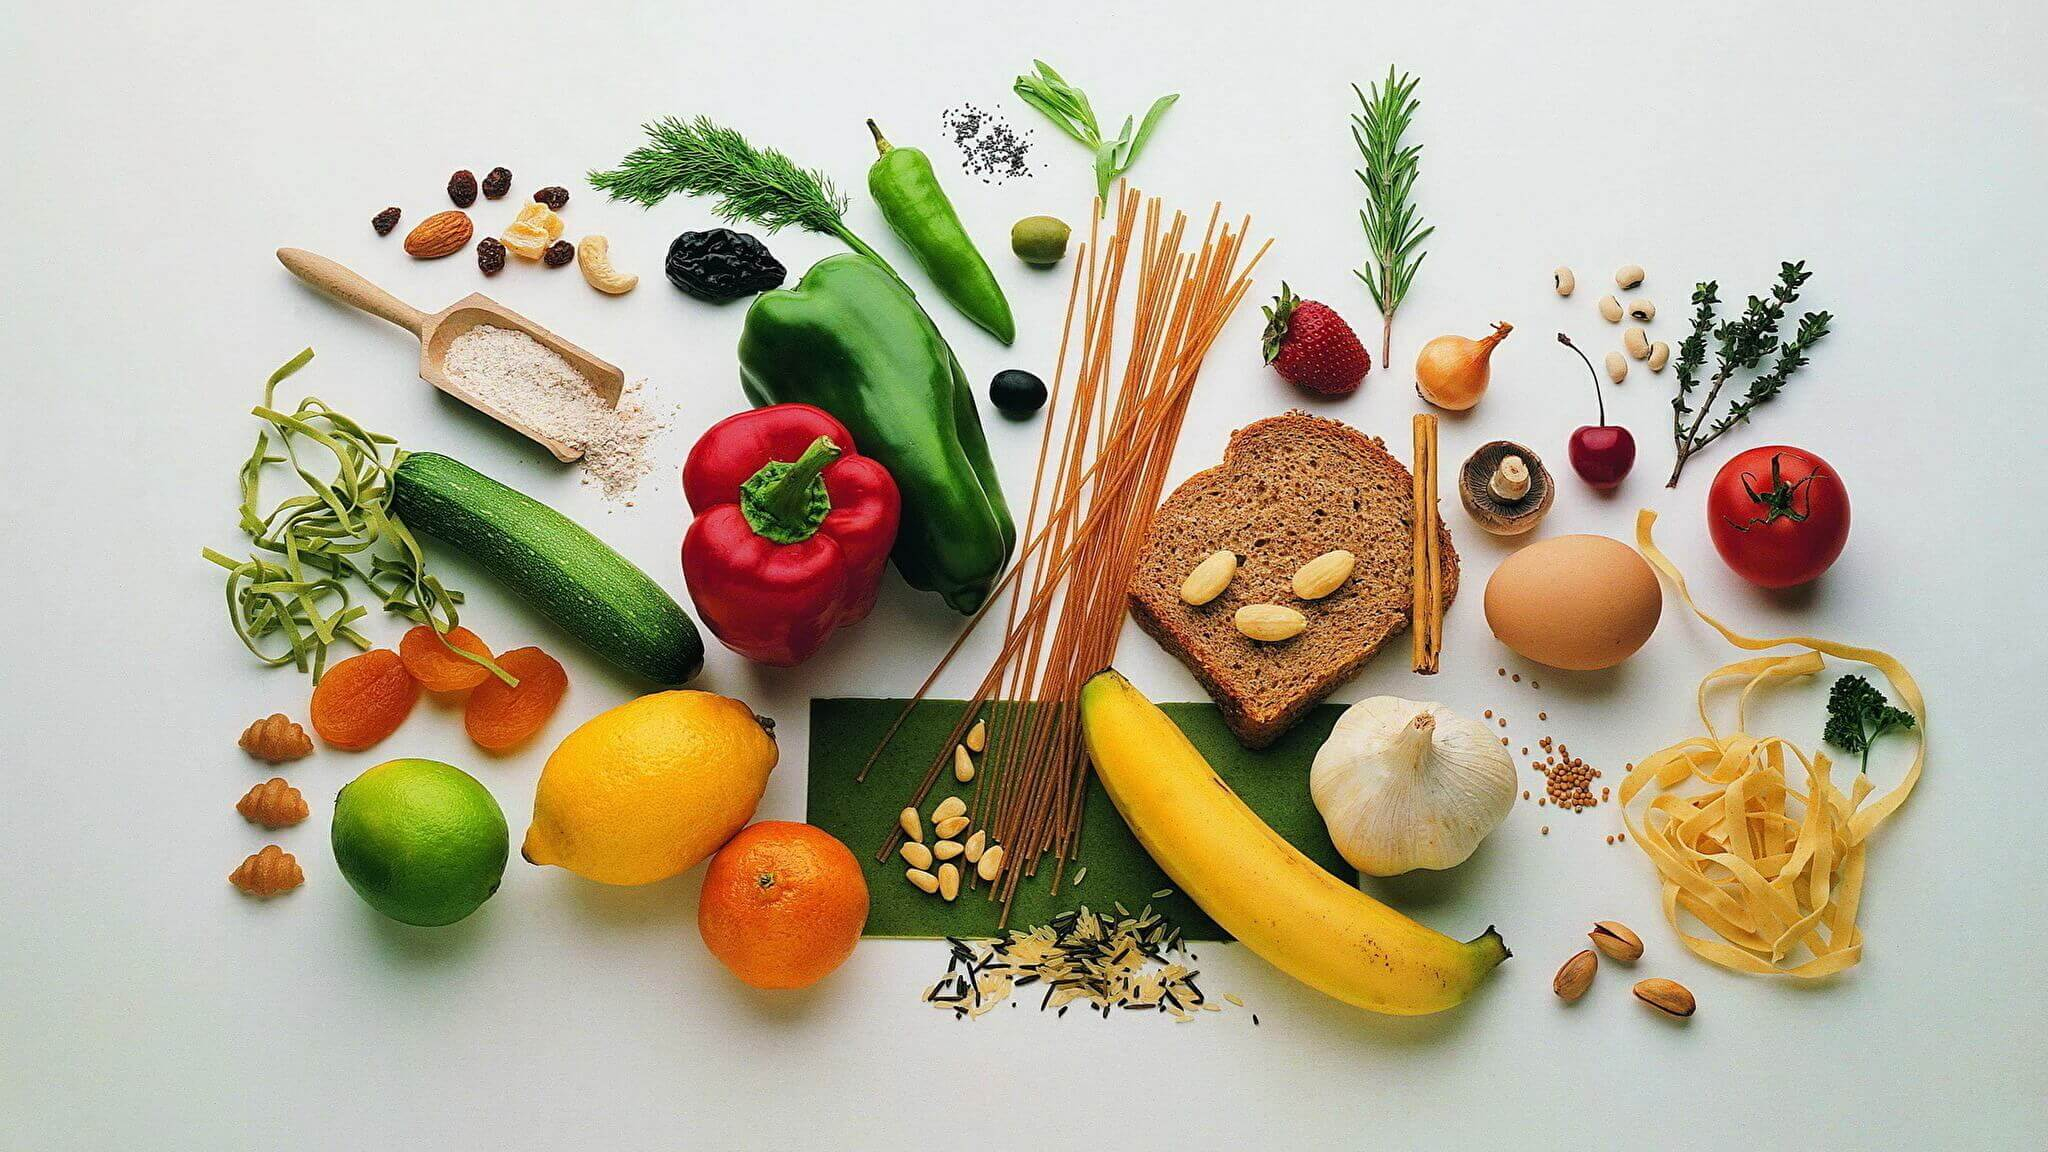 концепция питания